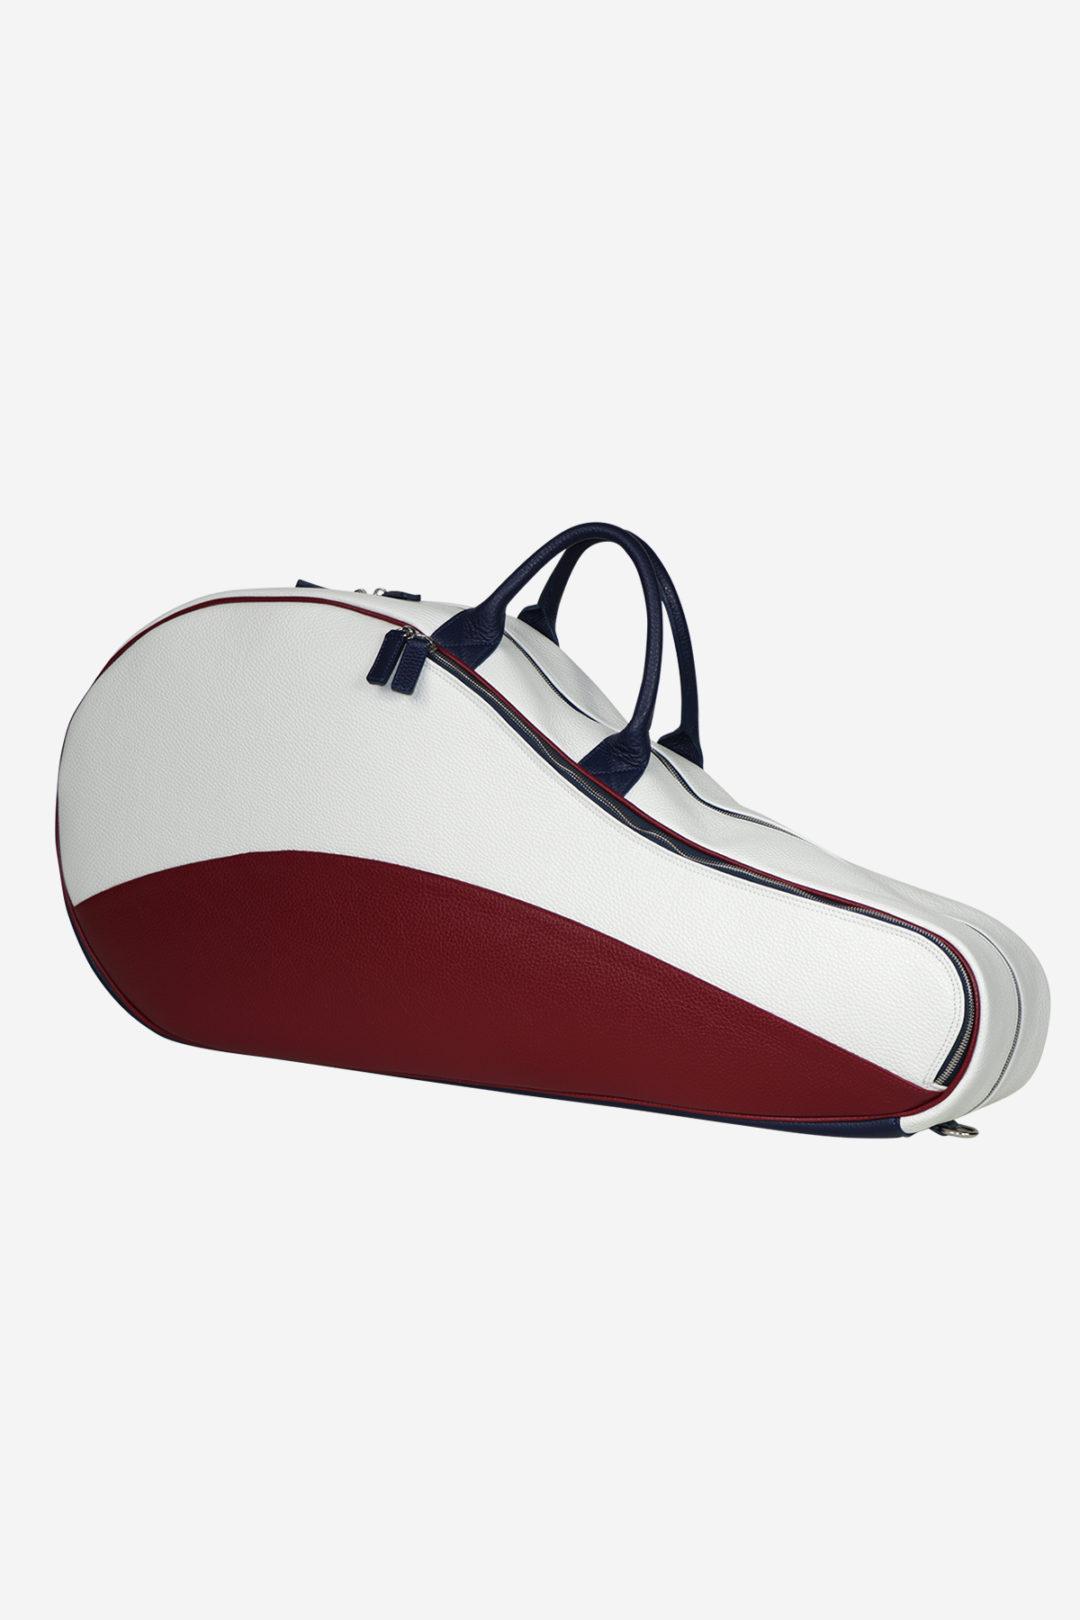 Original Tennis Bag